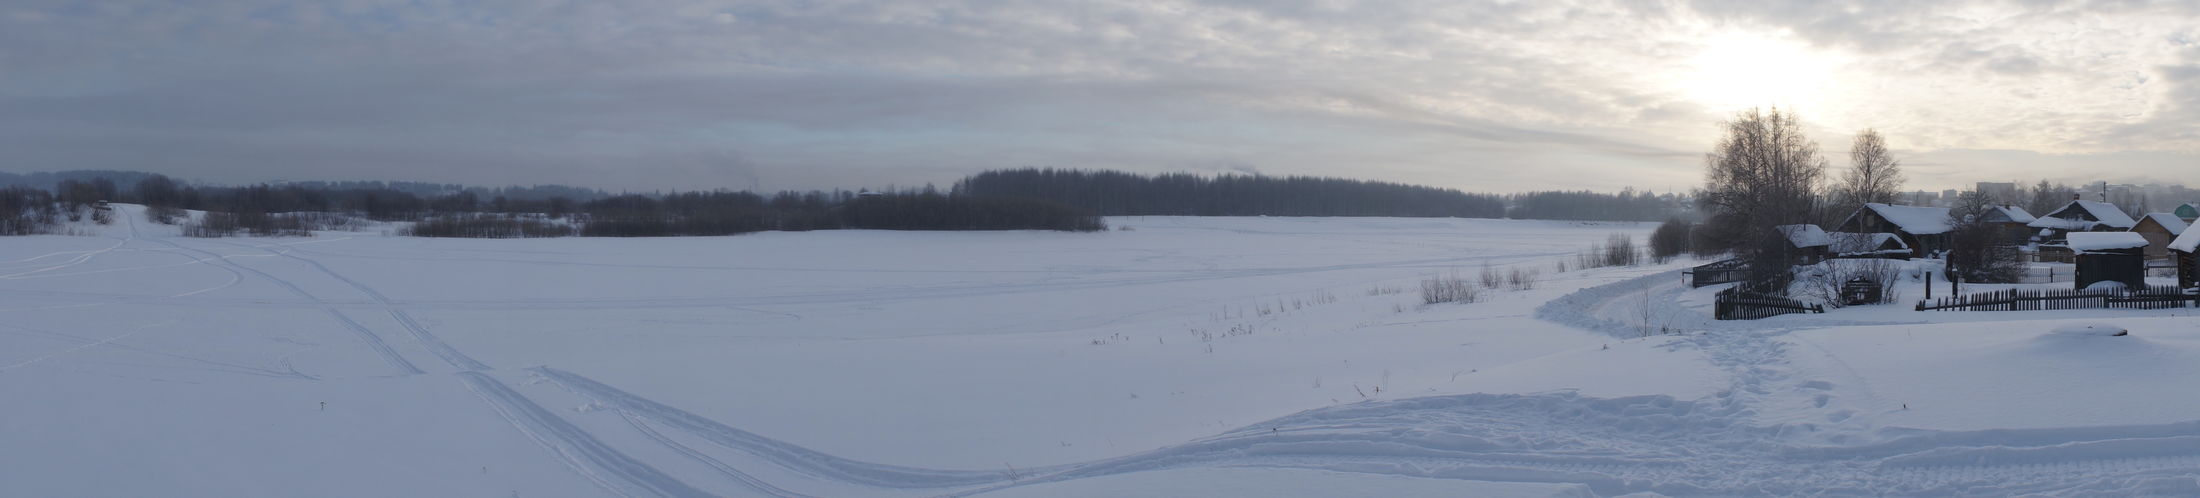 Snow ❄ Village View